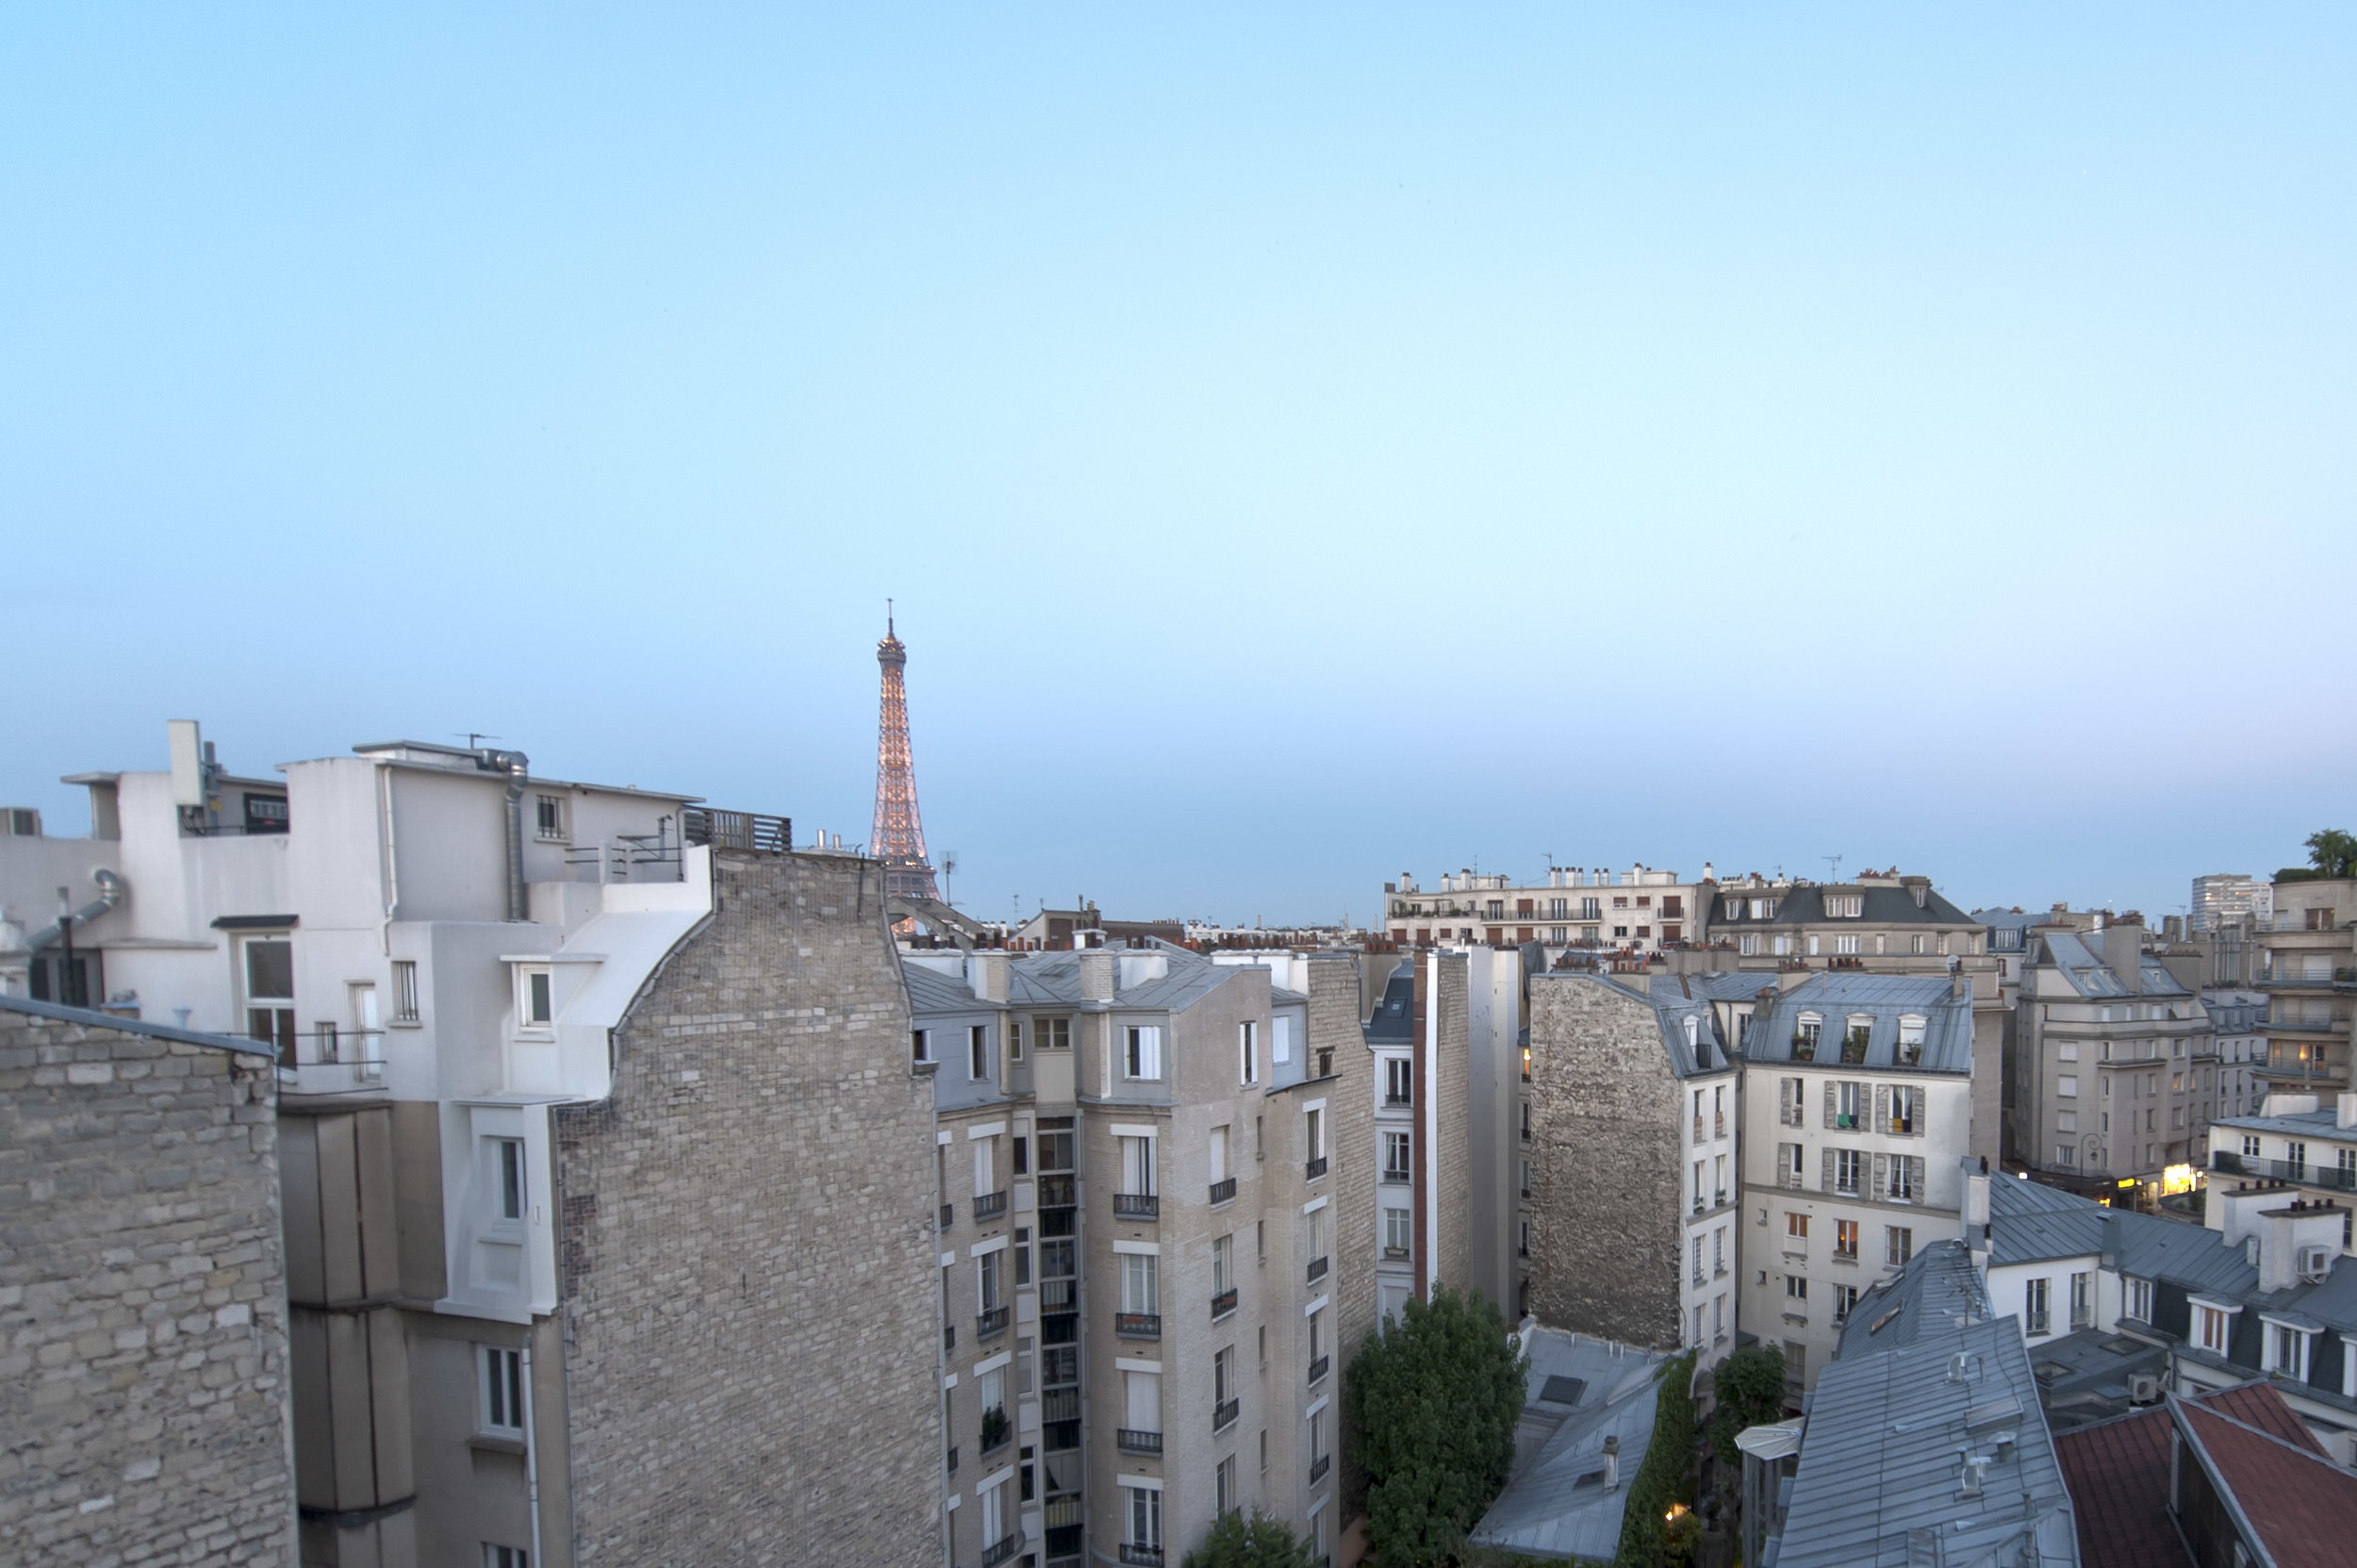 Paris_Nikon_20170505_010.jpg